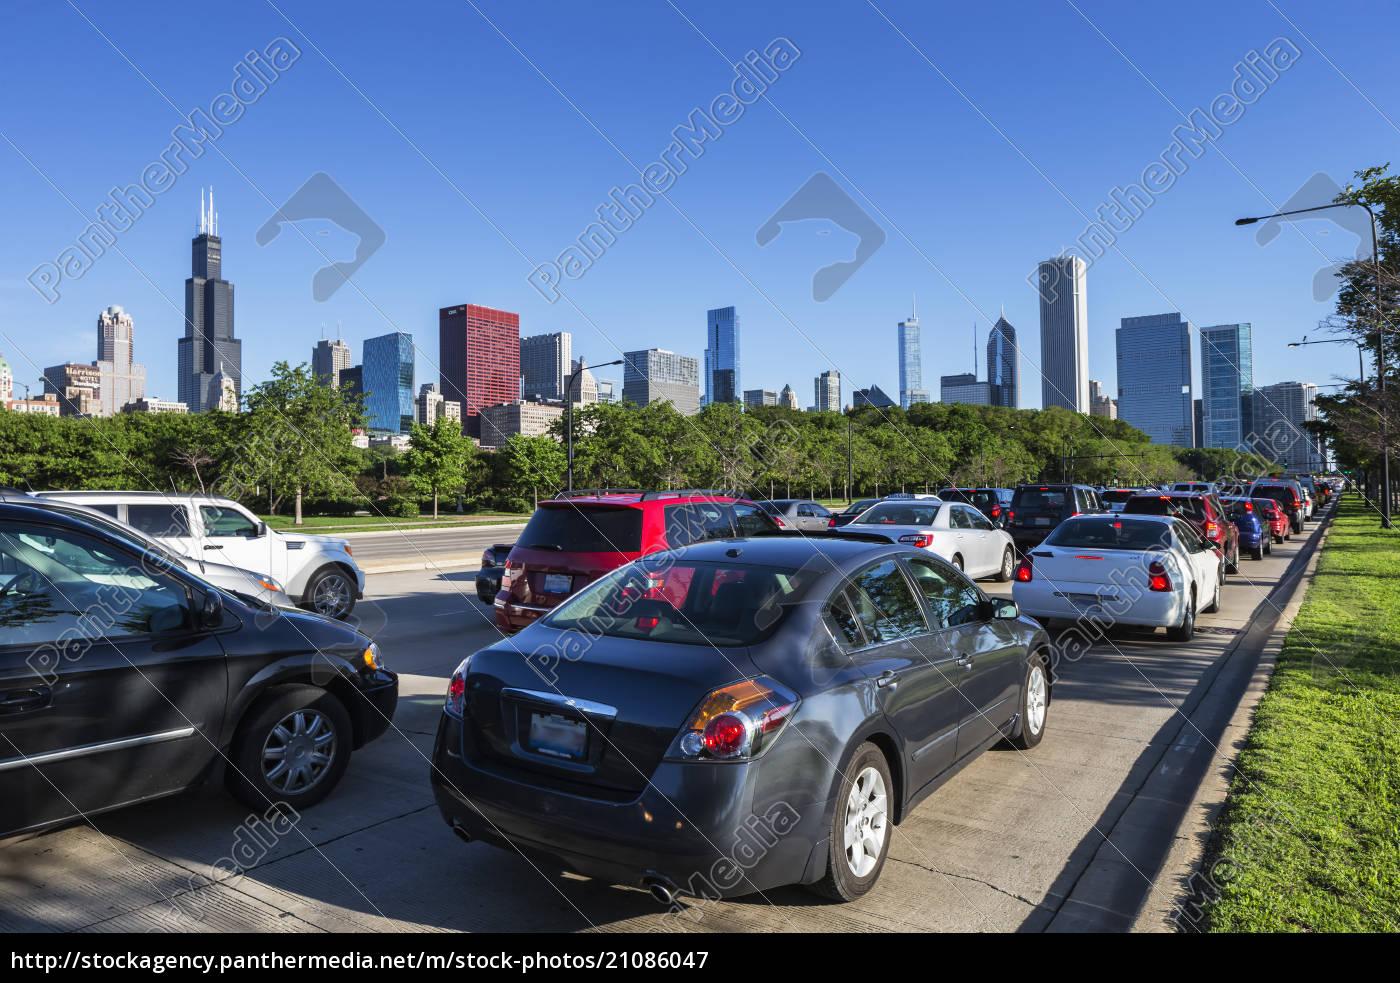 usa, illinois, chicago, stau, auf, dem, lake, shore, drive - 21086047